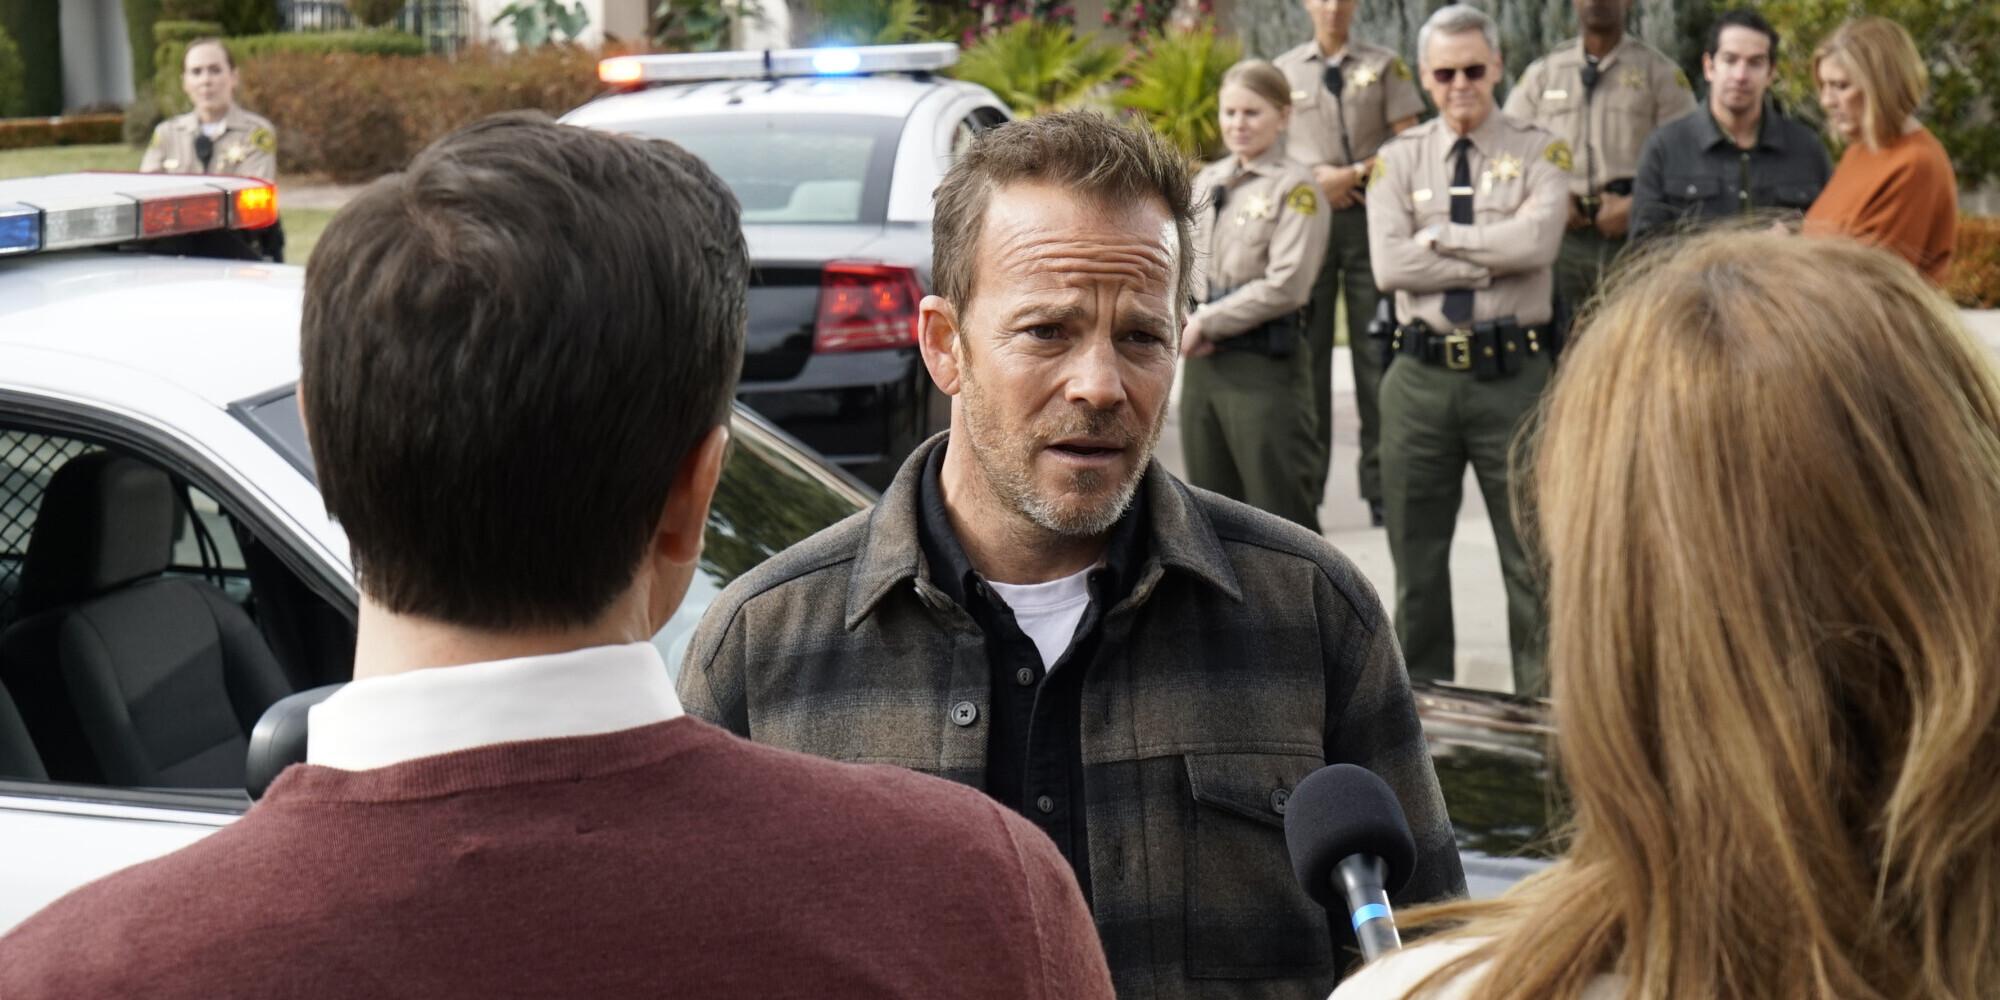 Deputy Season 2